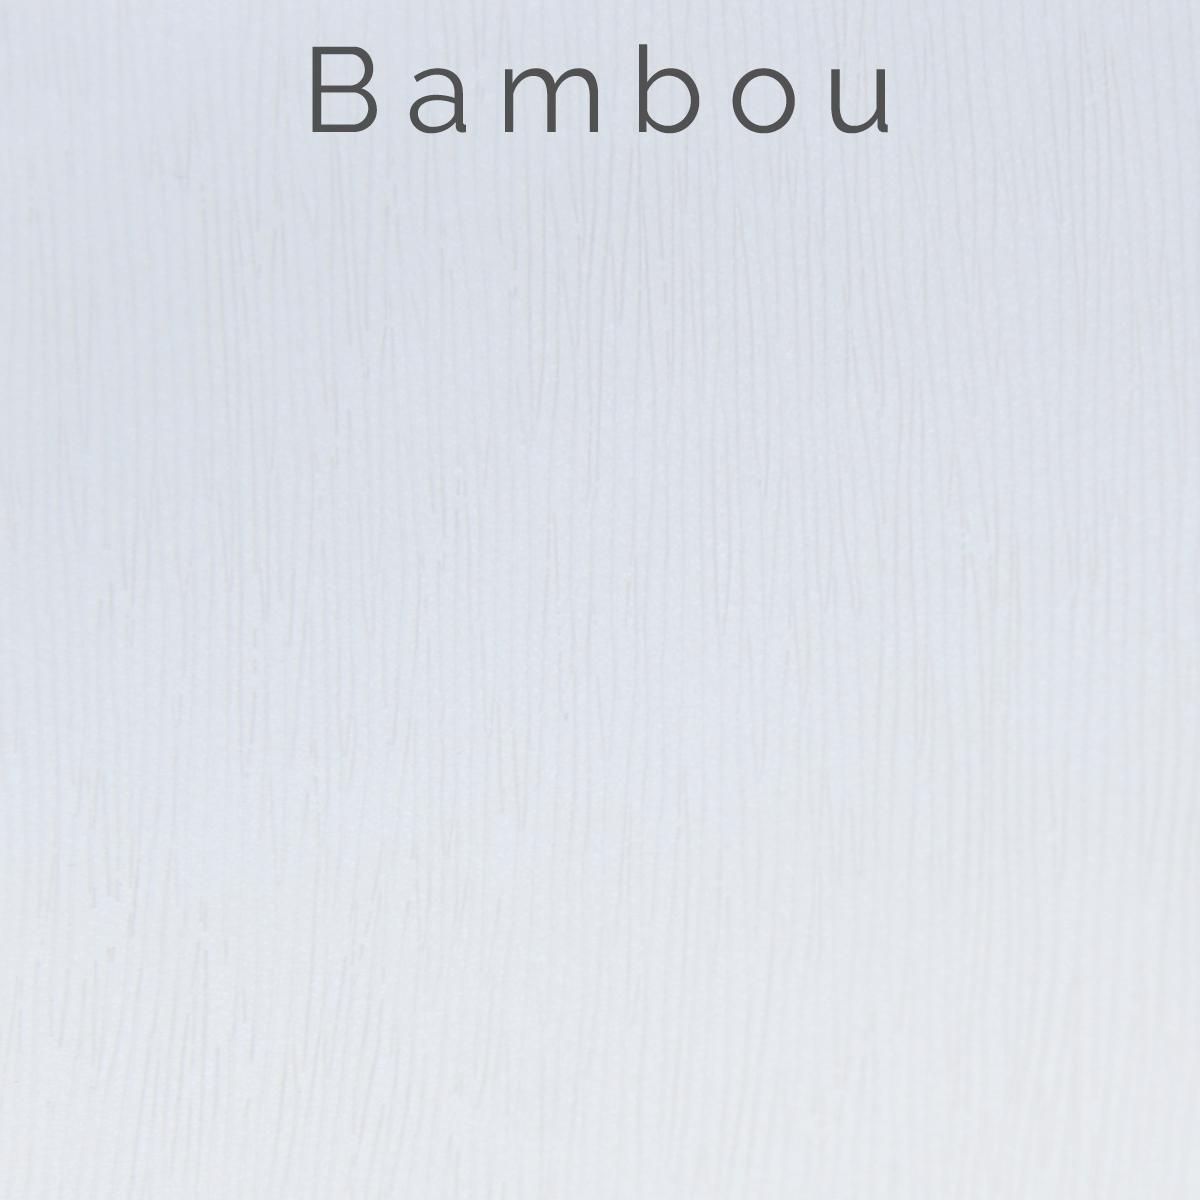 Polyart - Textured bambou